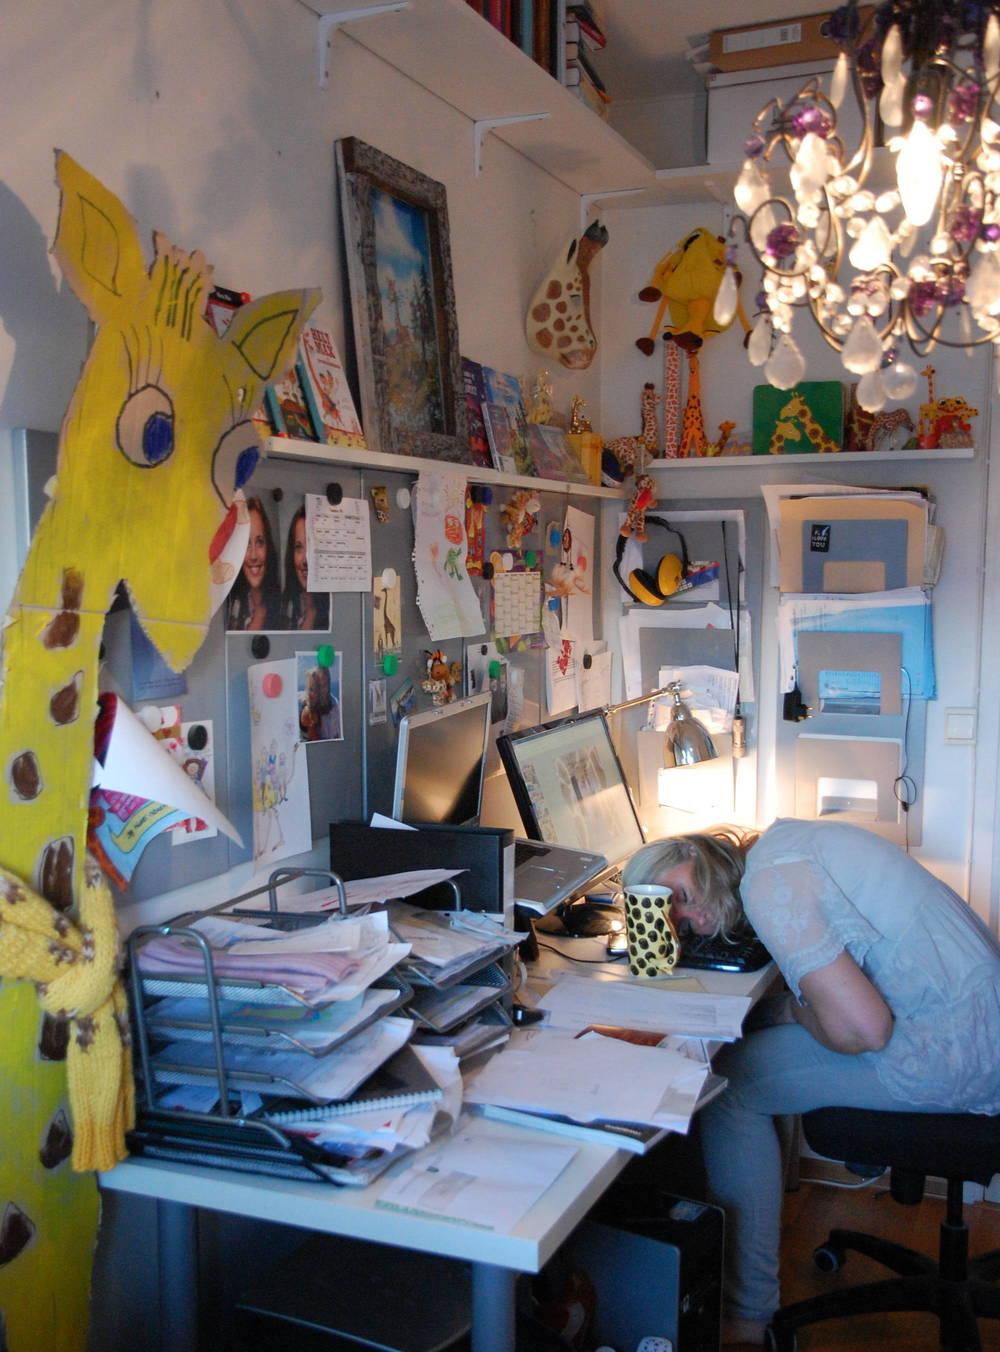 mari som sover på kontoret - DSC_6575.JPG